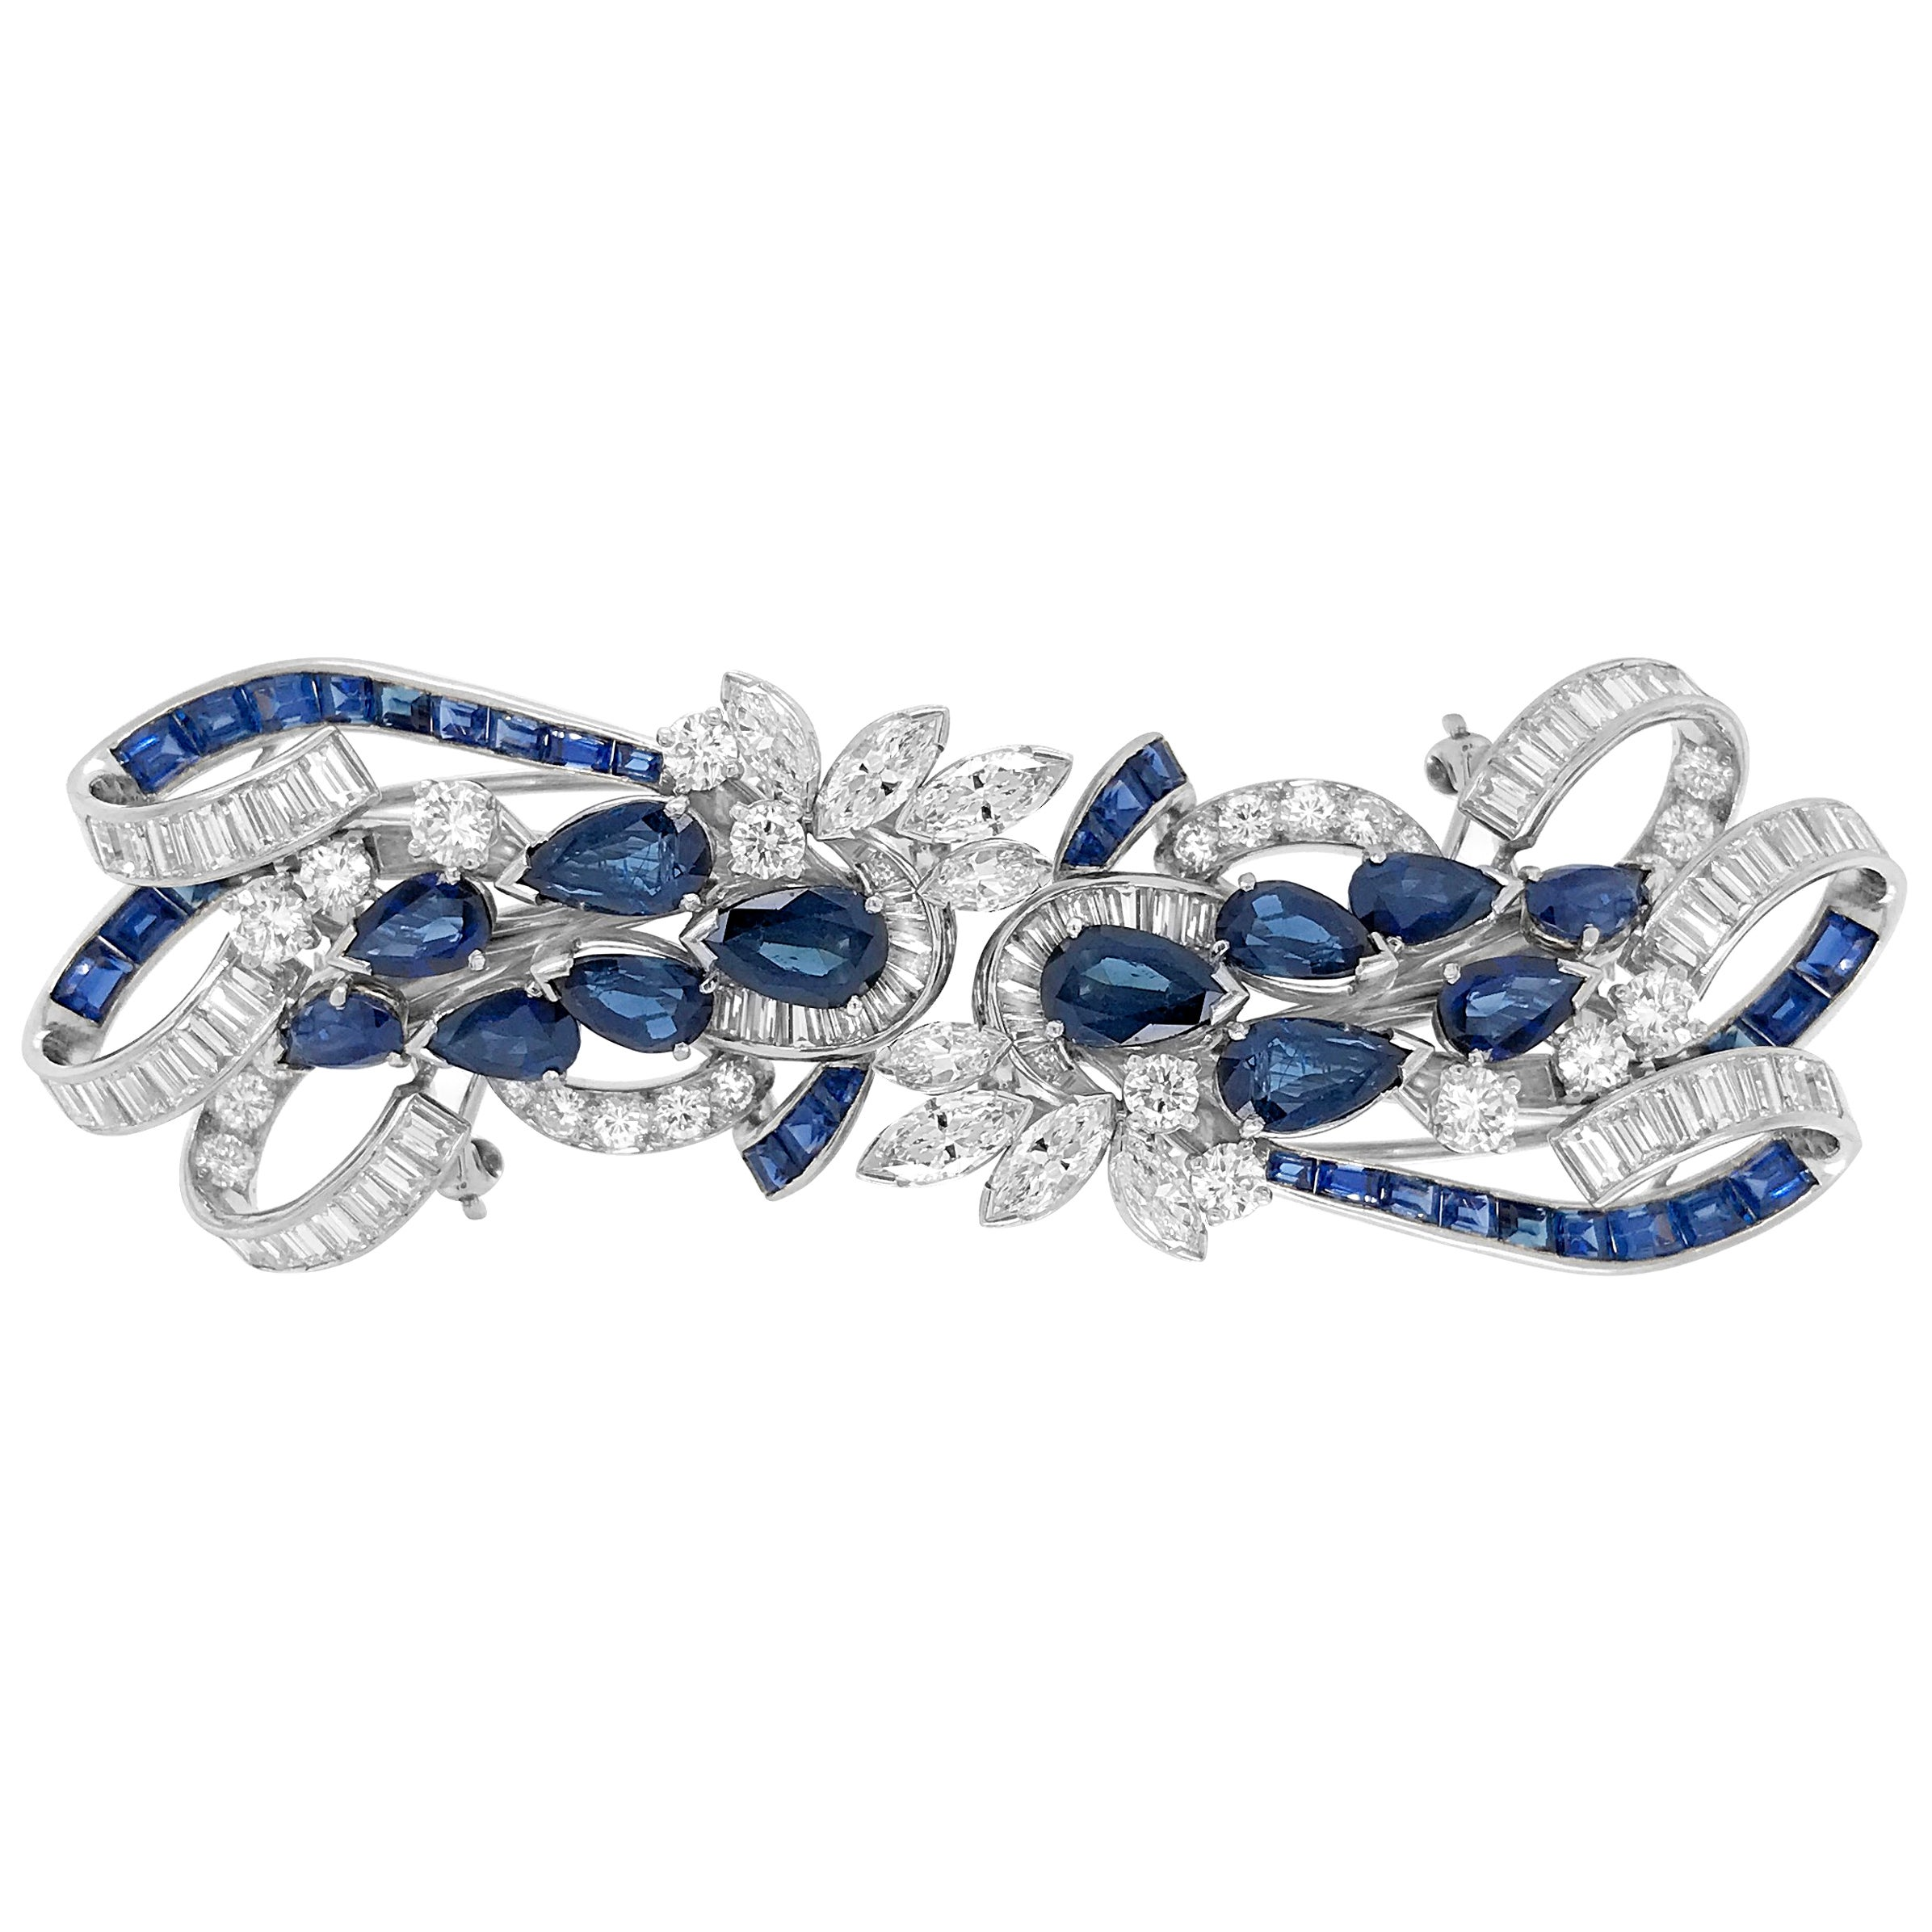 Tiffany & Co. Sapphire and Diamond Double-Clip Brooch